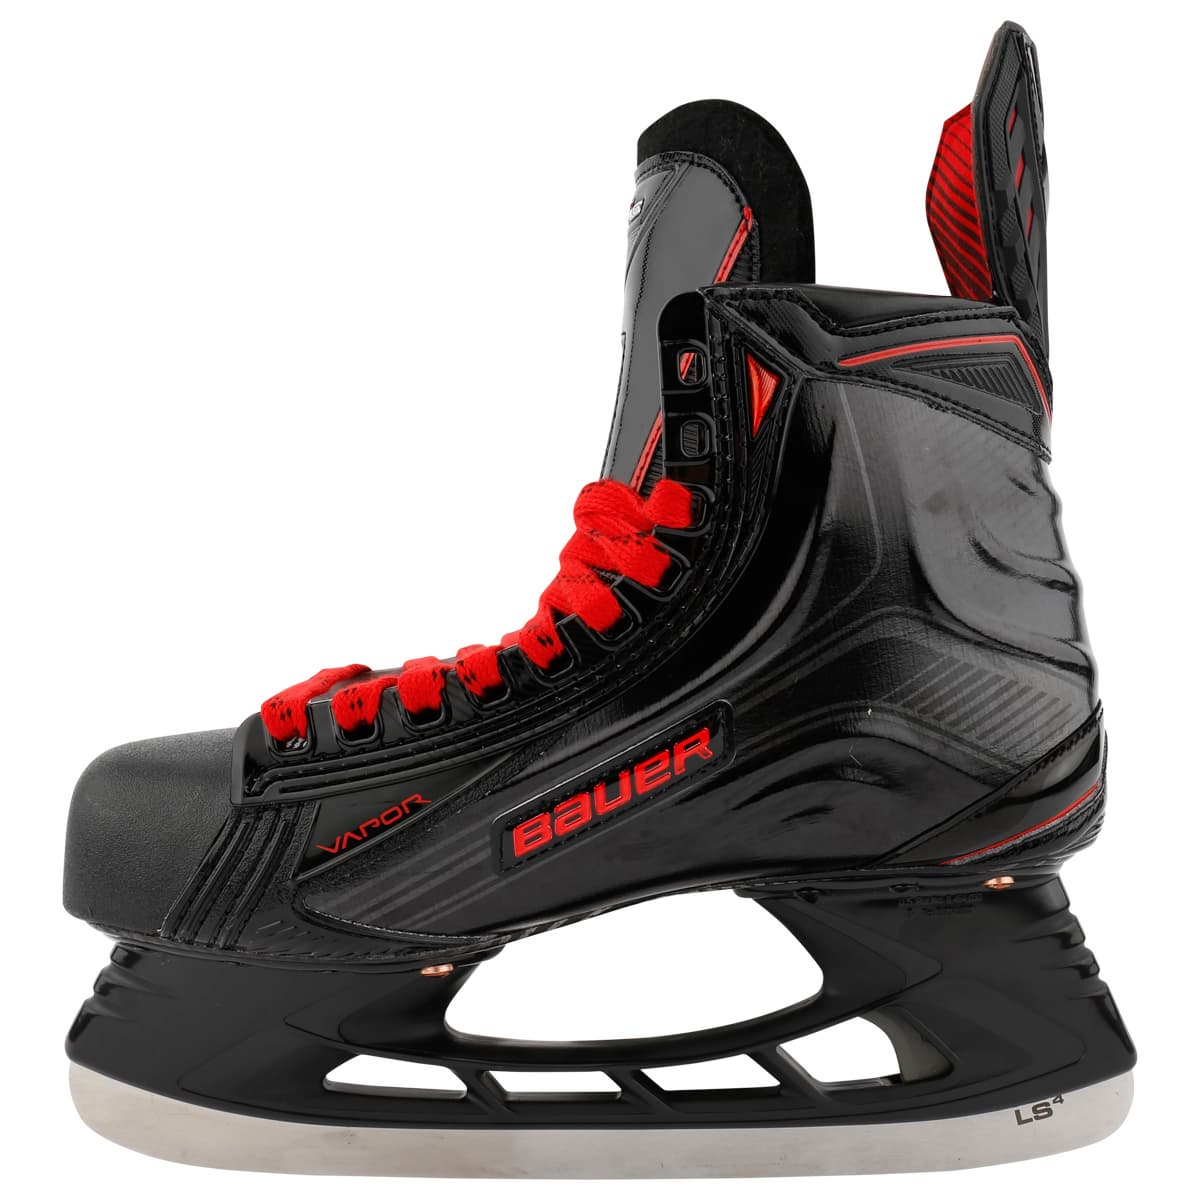 Bauer Vapor 1x Le Ice Hockey Skates